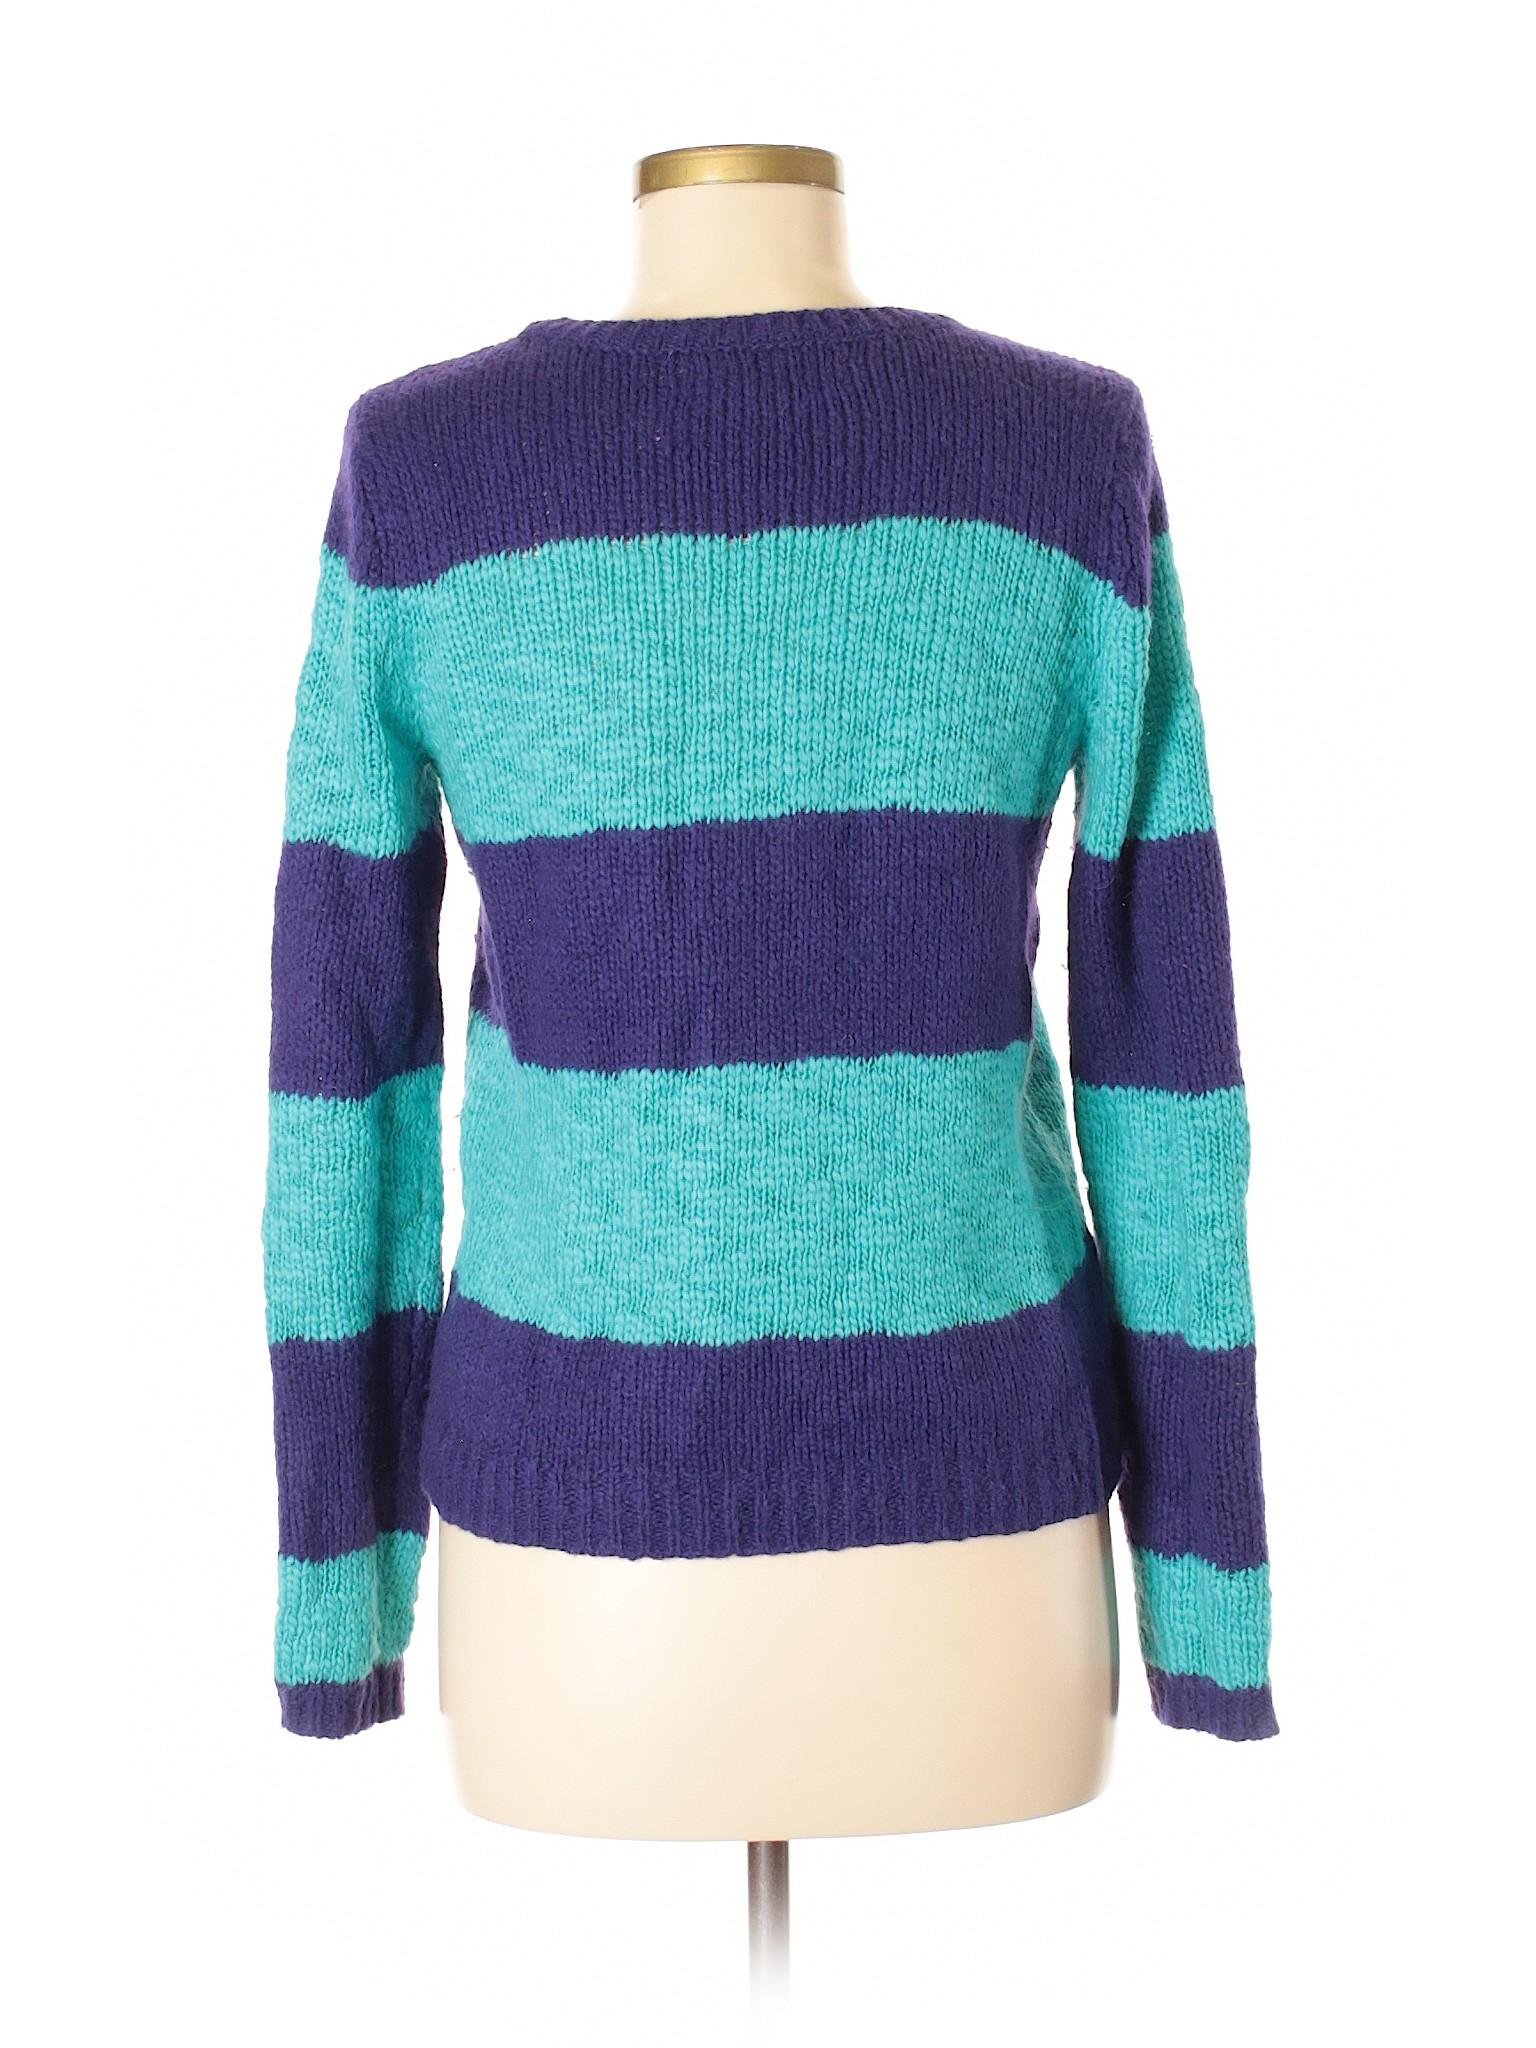 LOFT Pullover Sweater Boutique Ann Taylor gRxnnBt